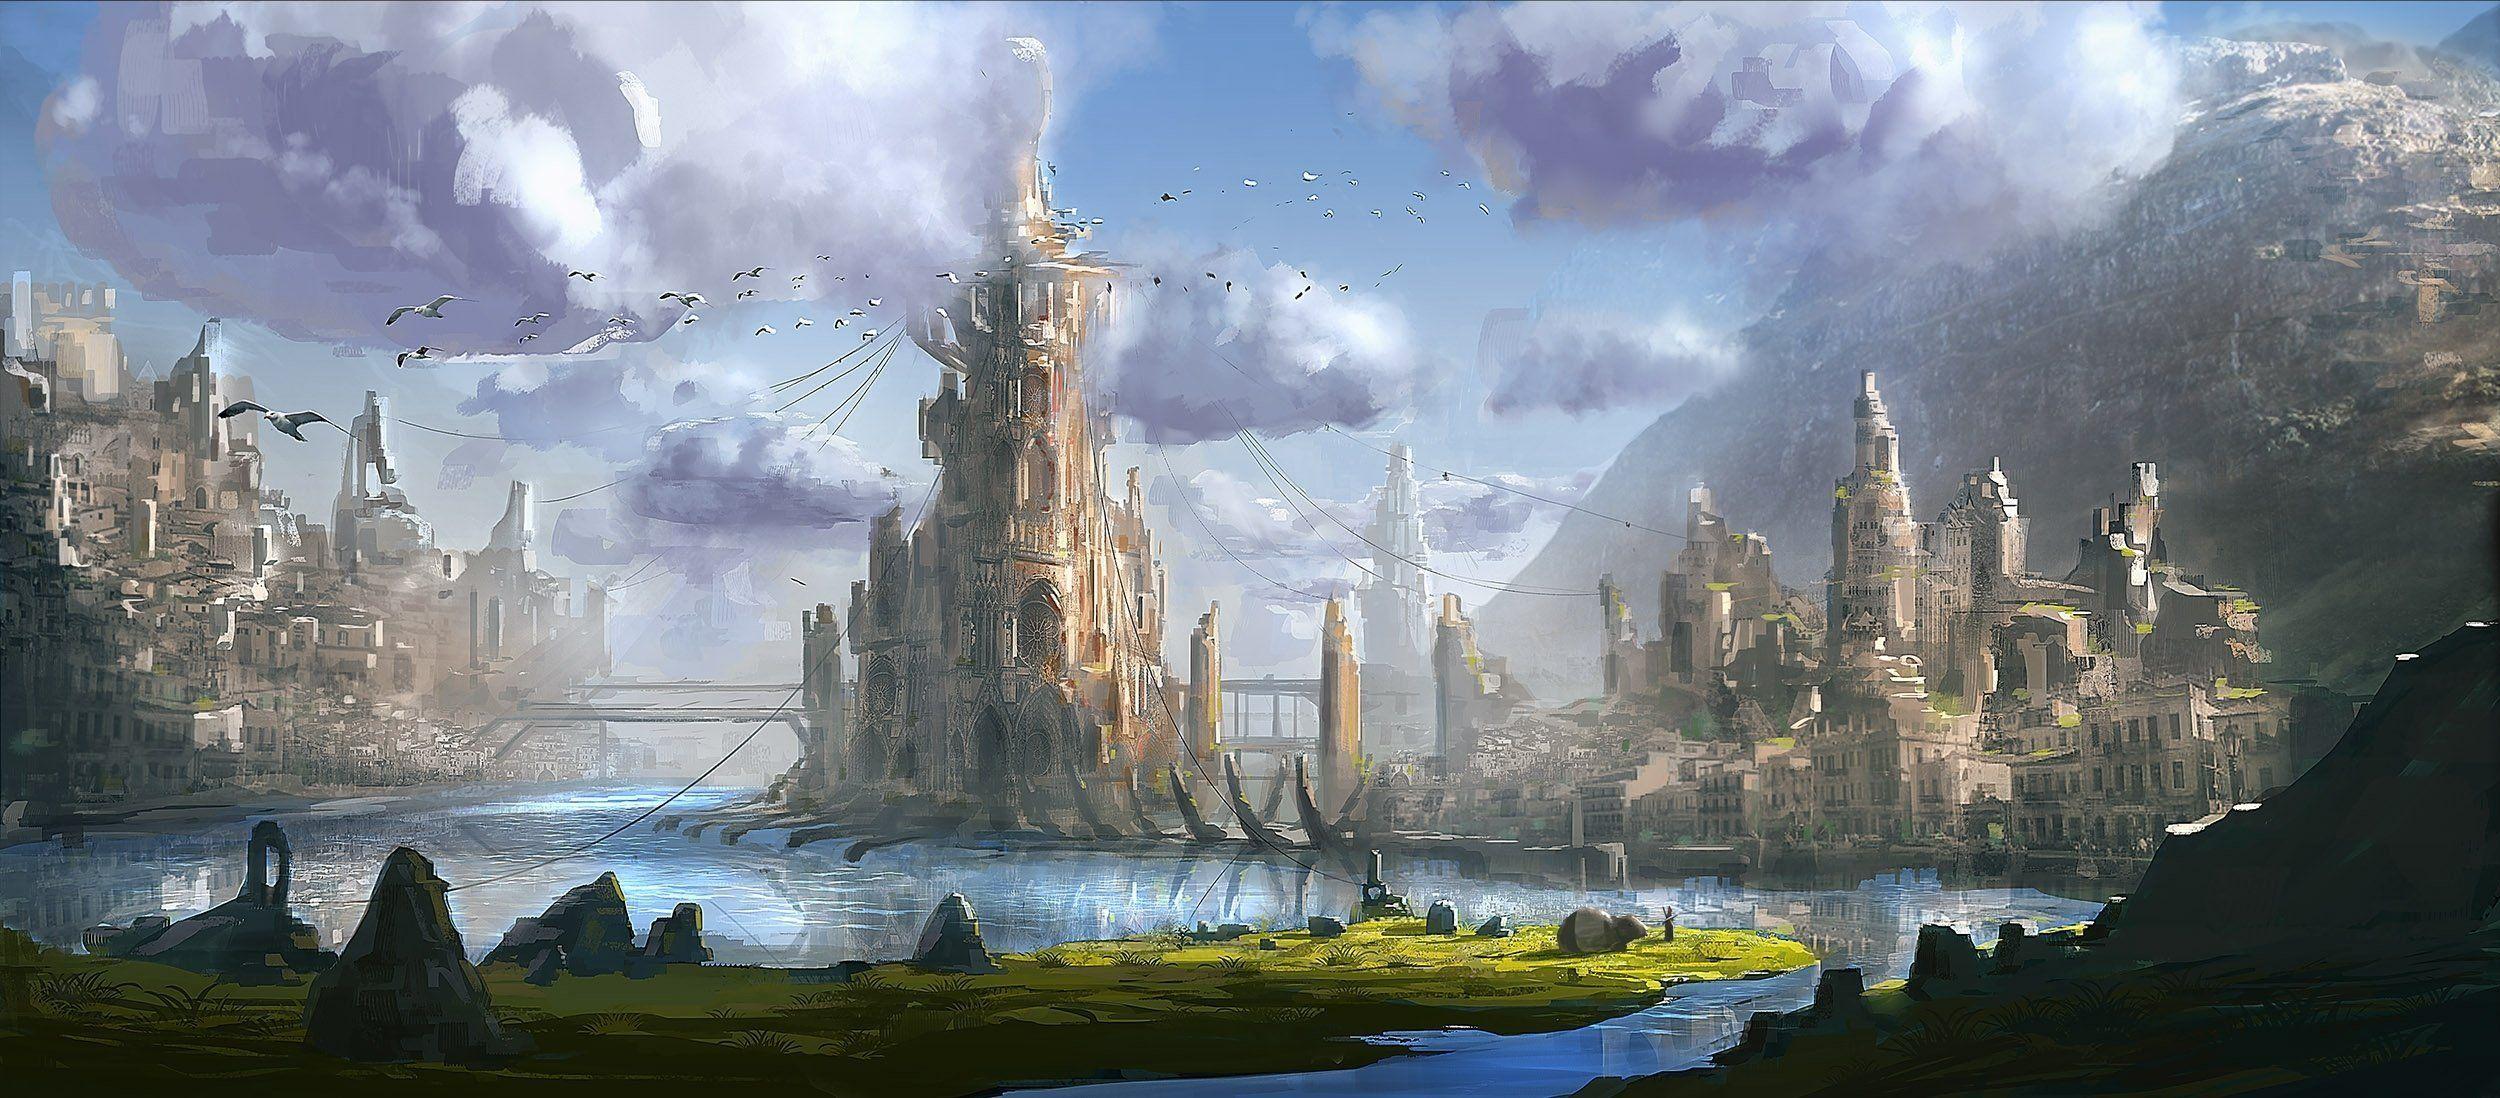 Art Town Fantasy World Water Mountain Bridge Tower Hd Wallpaper Fantasy Landscape Fantasy City Fantasy Castle